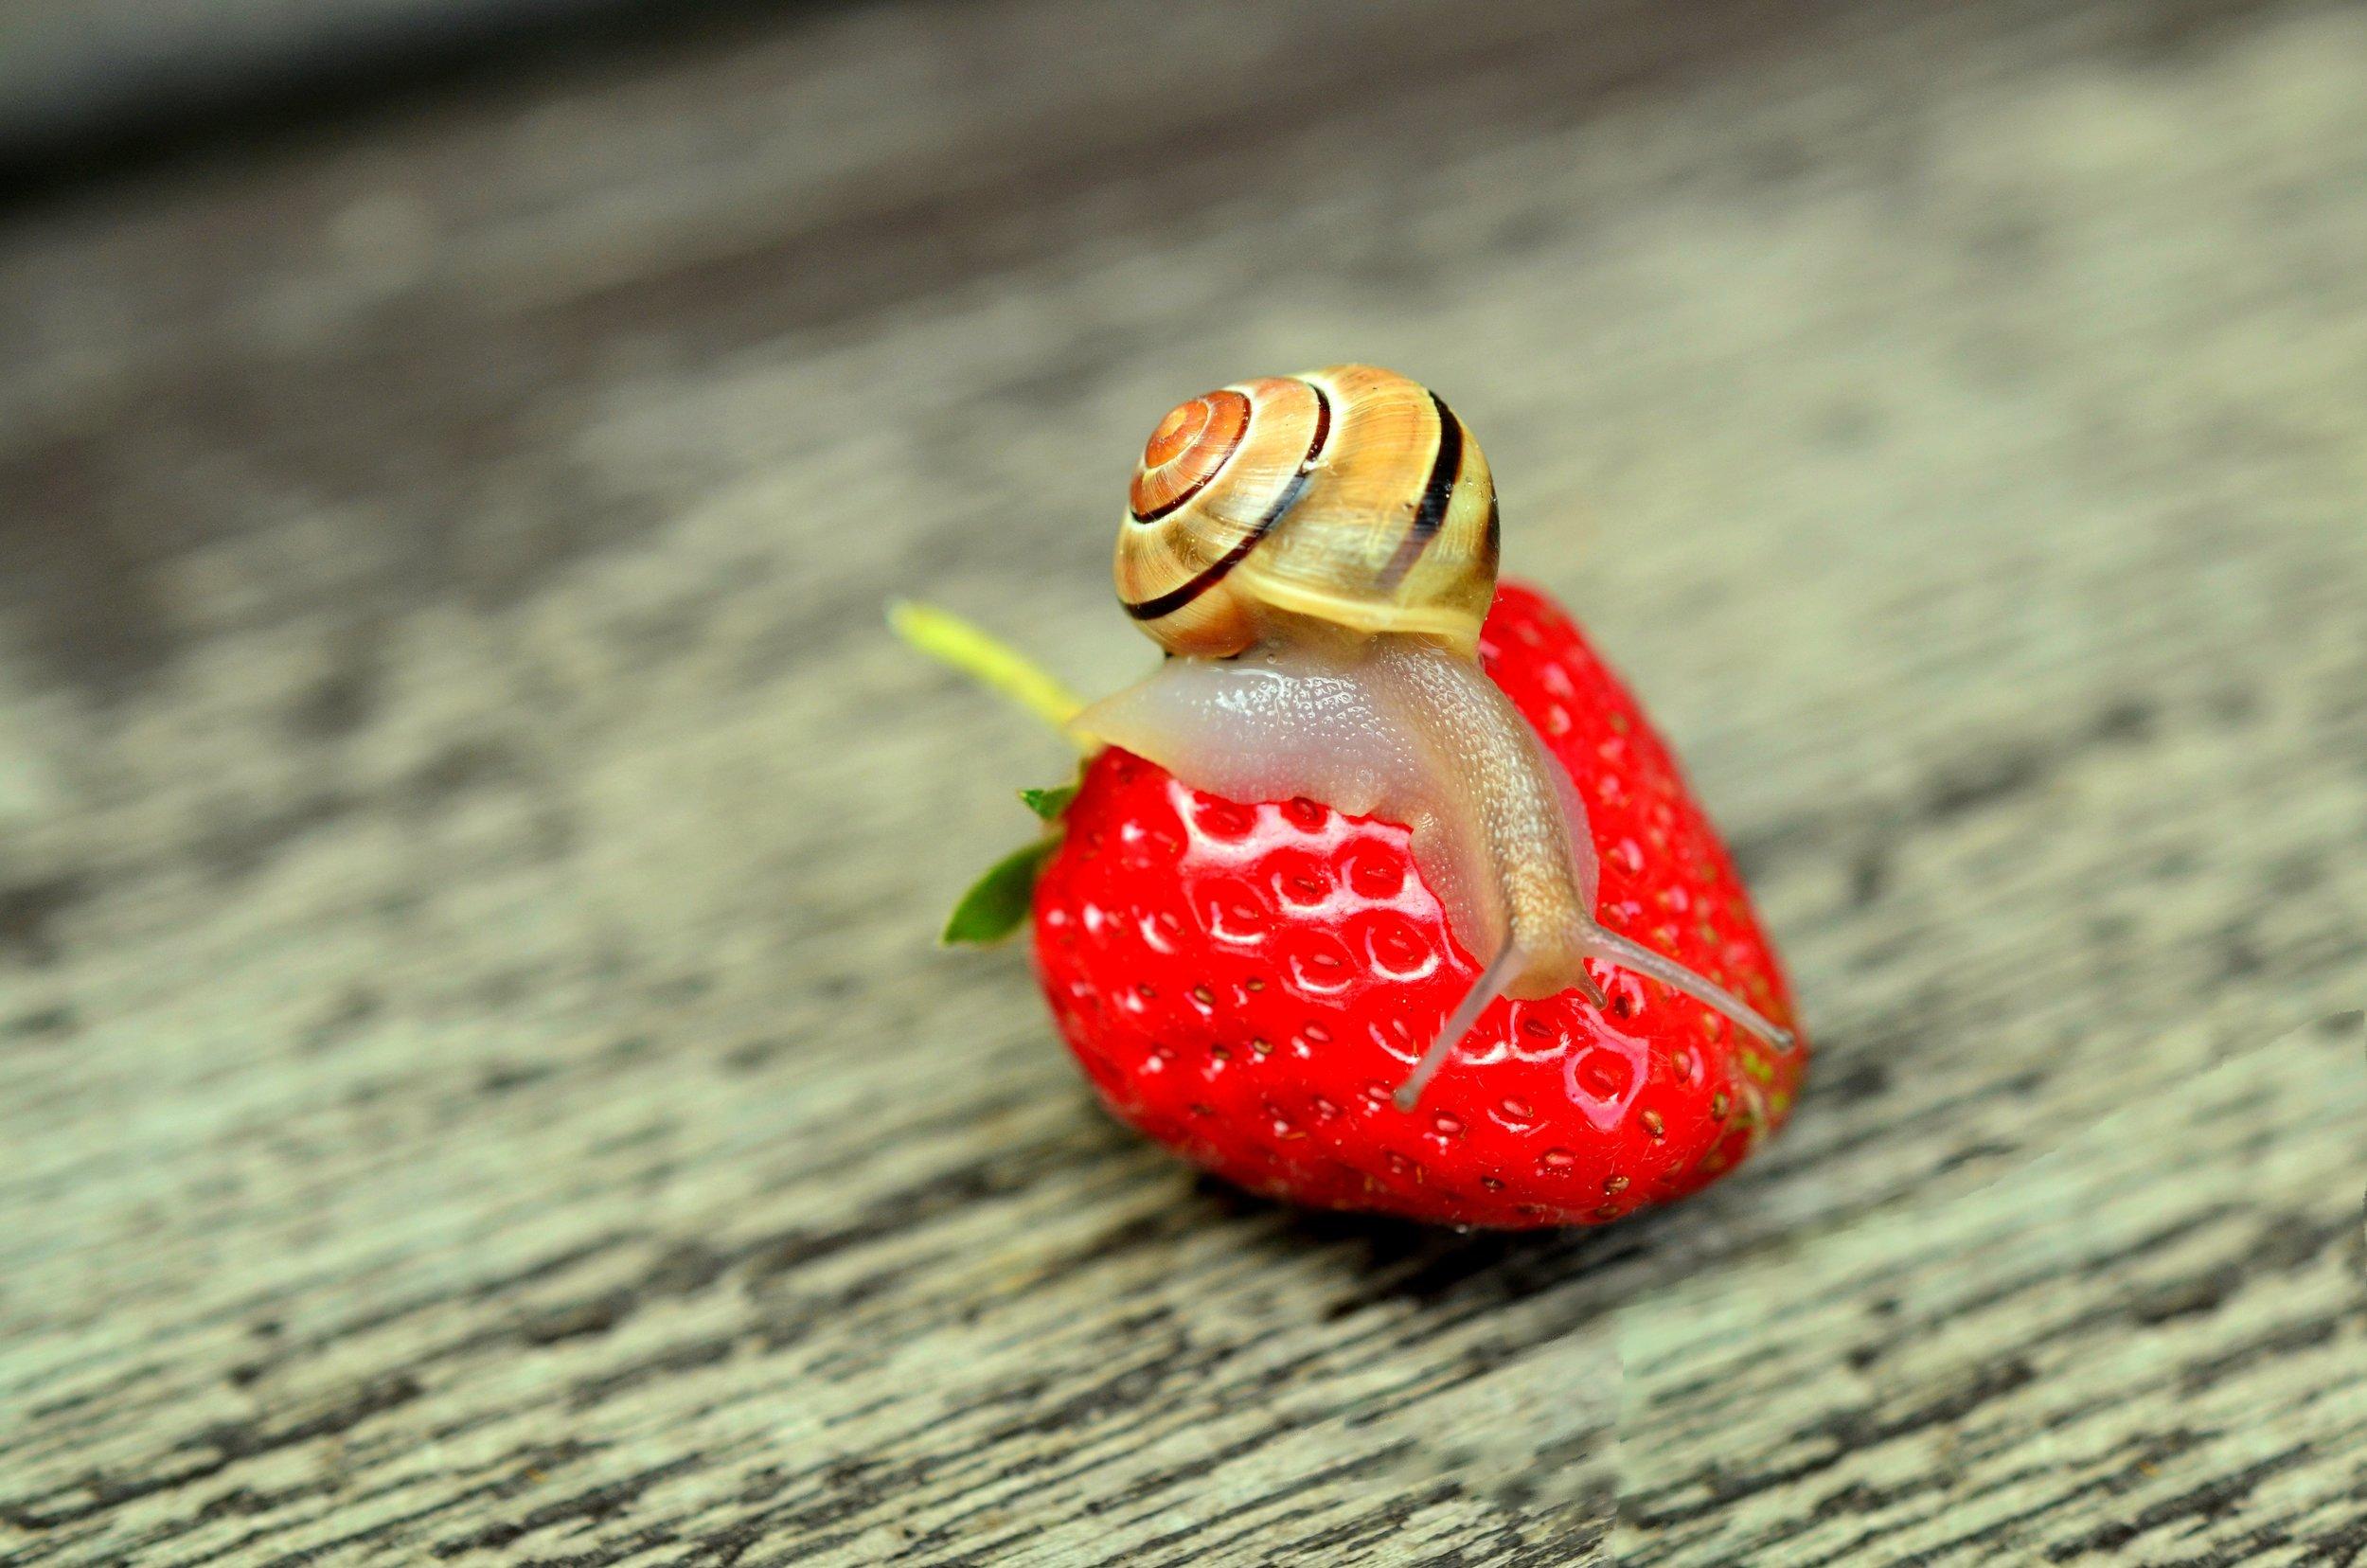 strawberry-snail-tape-worm-animal.jpg